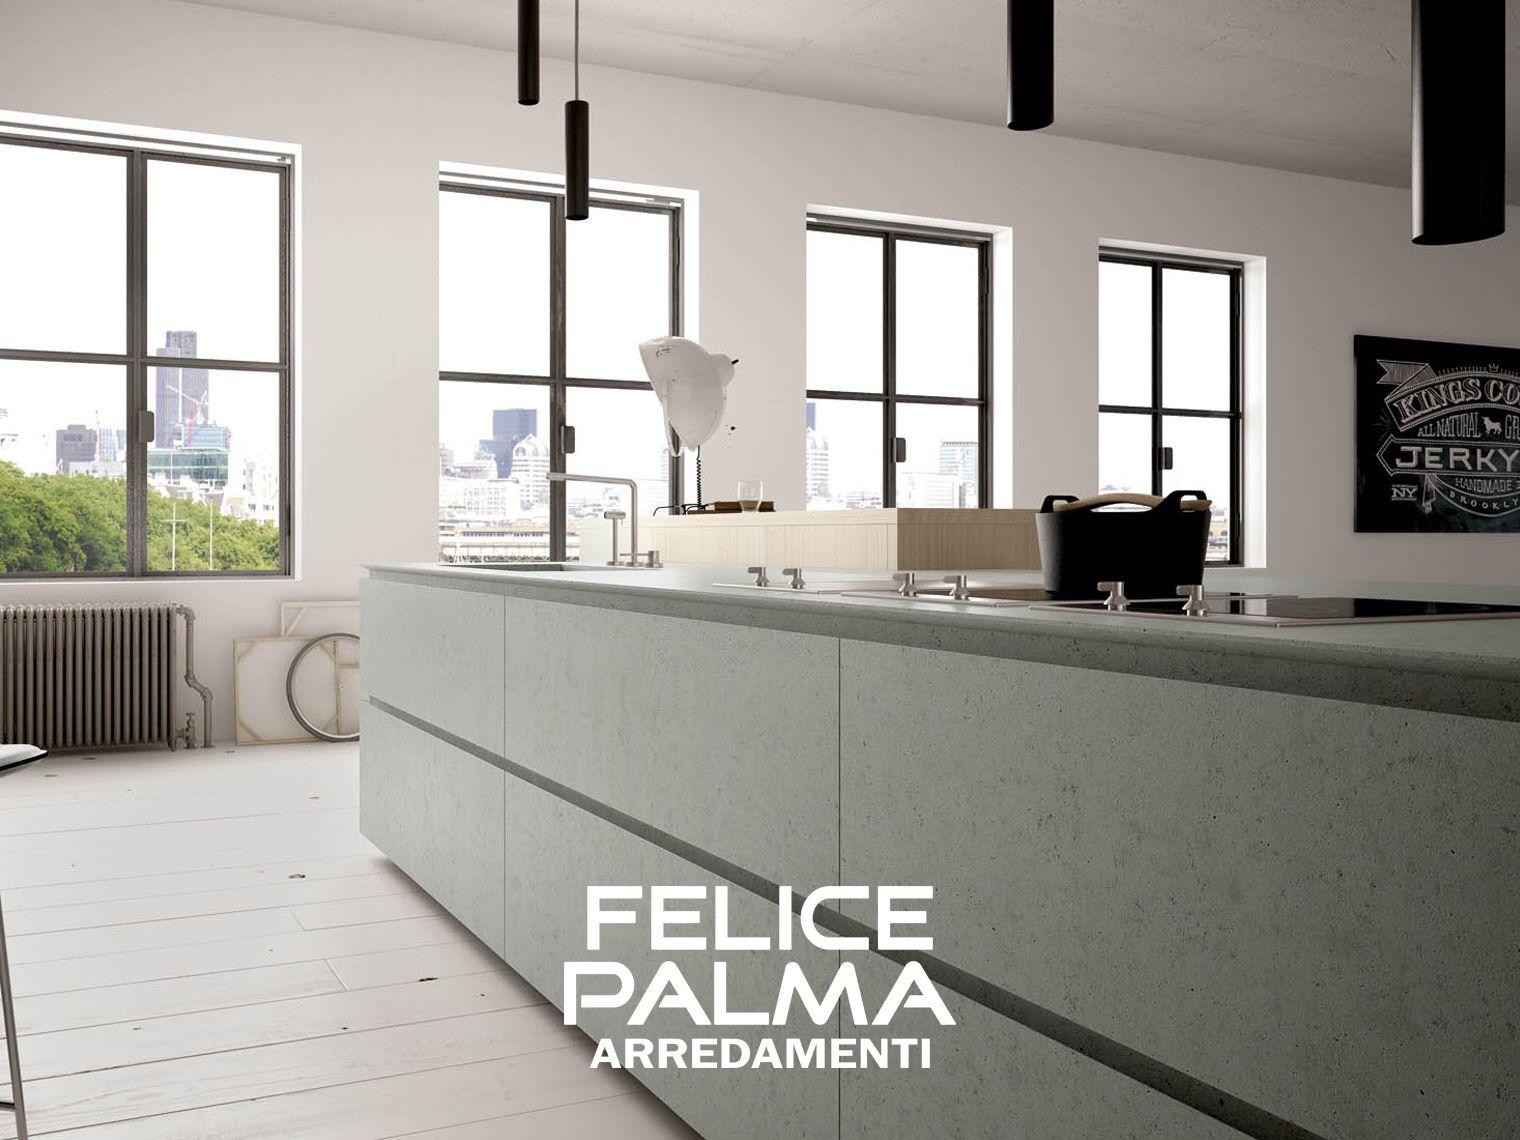 Cucina cemento ante legno moderno contemporaneo for Felice palma arredamenti